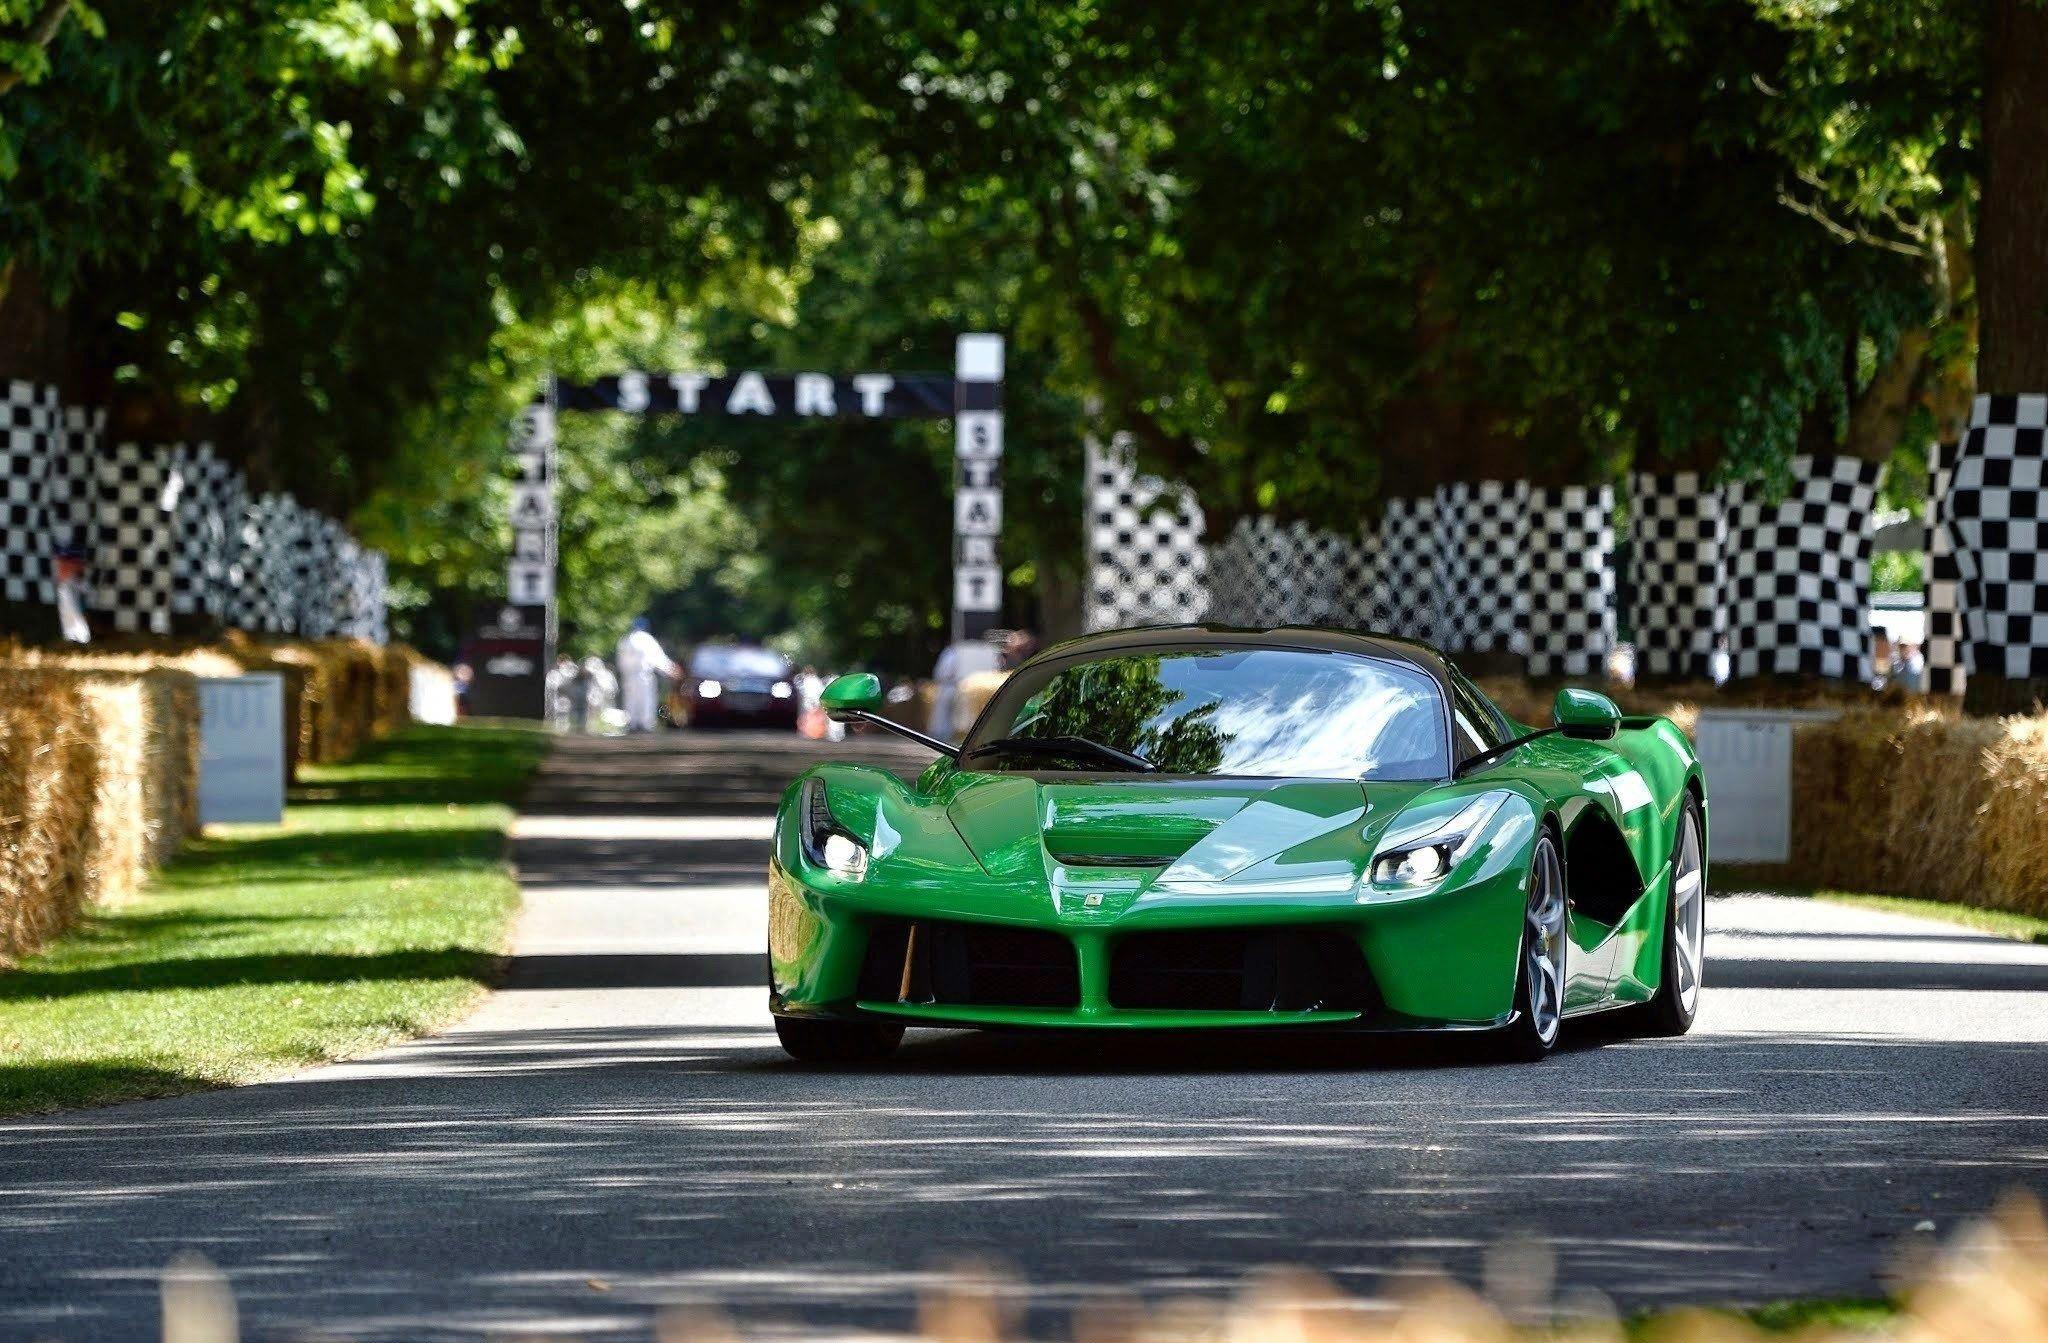 Green Ferrari Laferrari Wallpaper - Wallpaper Xfree